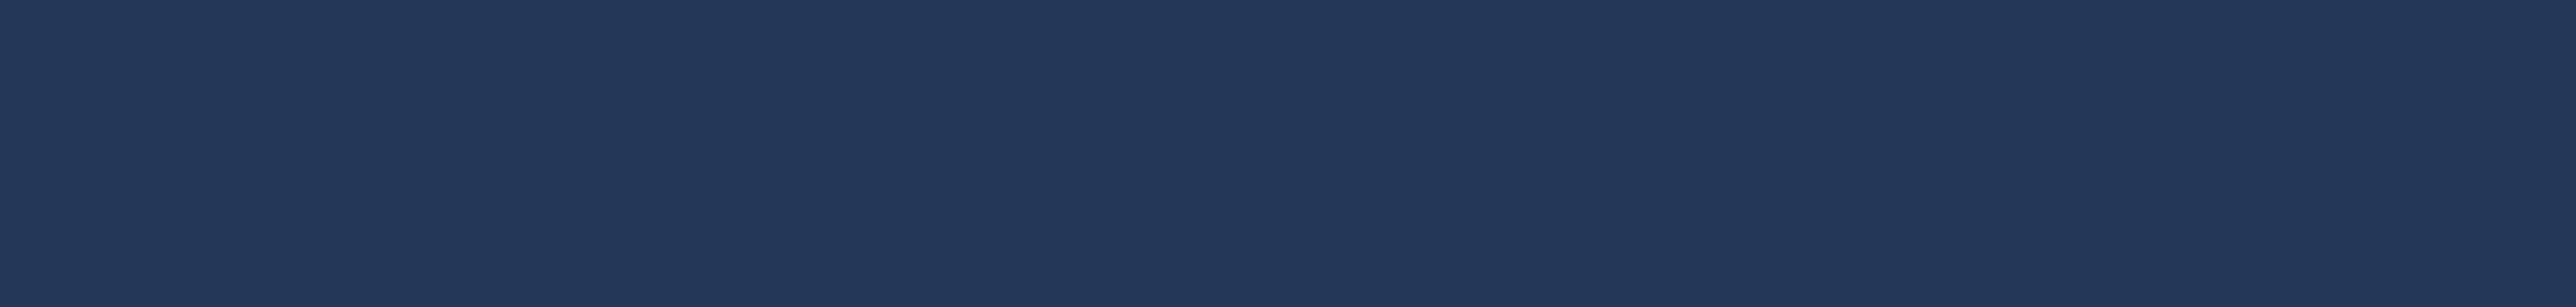 Appdynamics 徽标